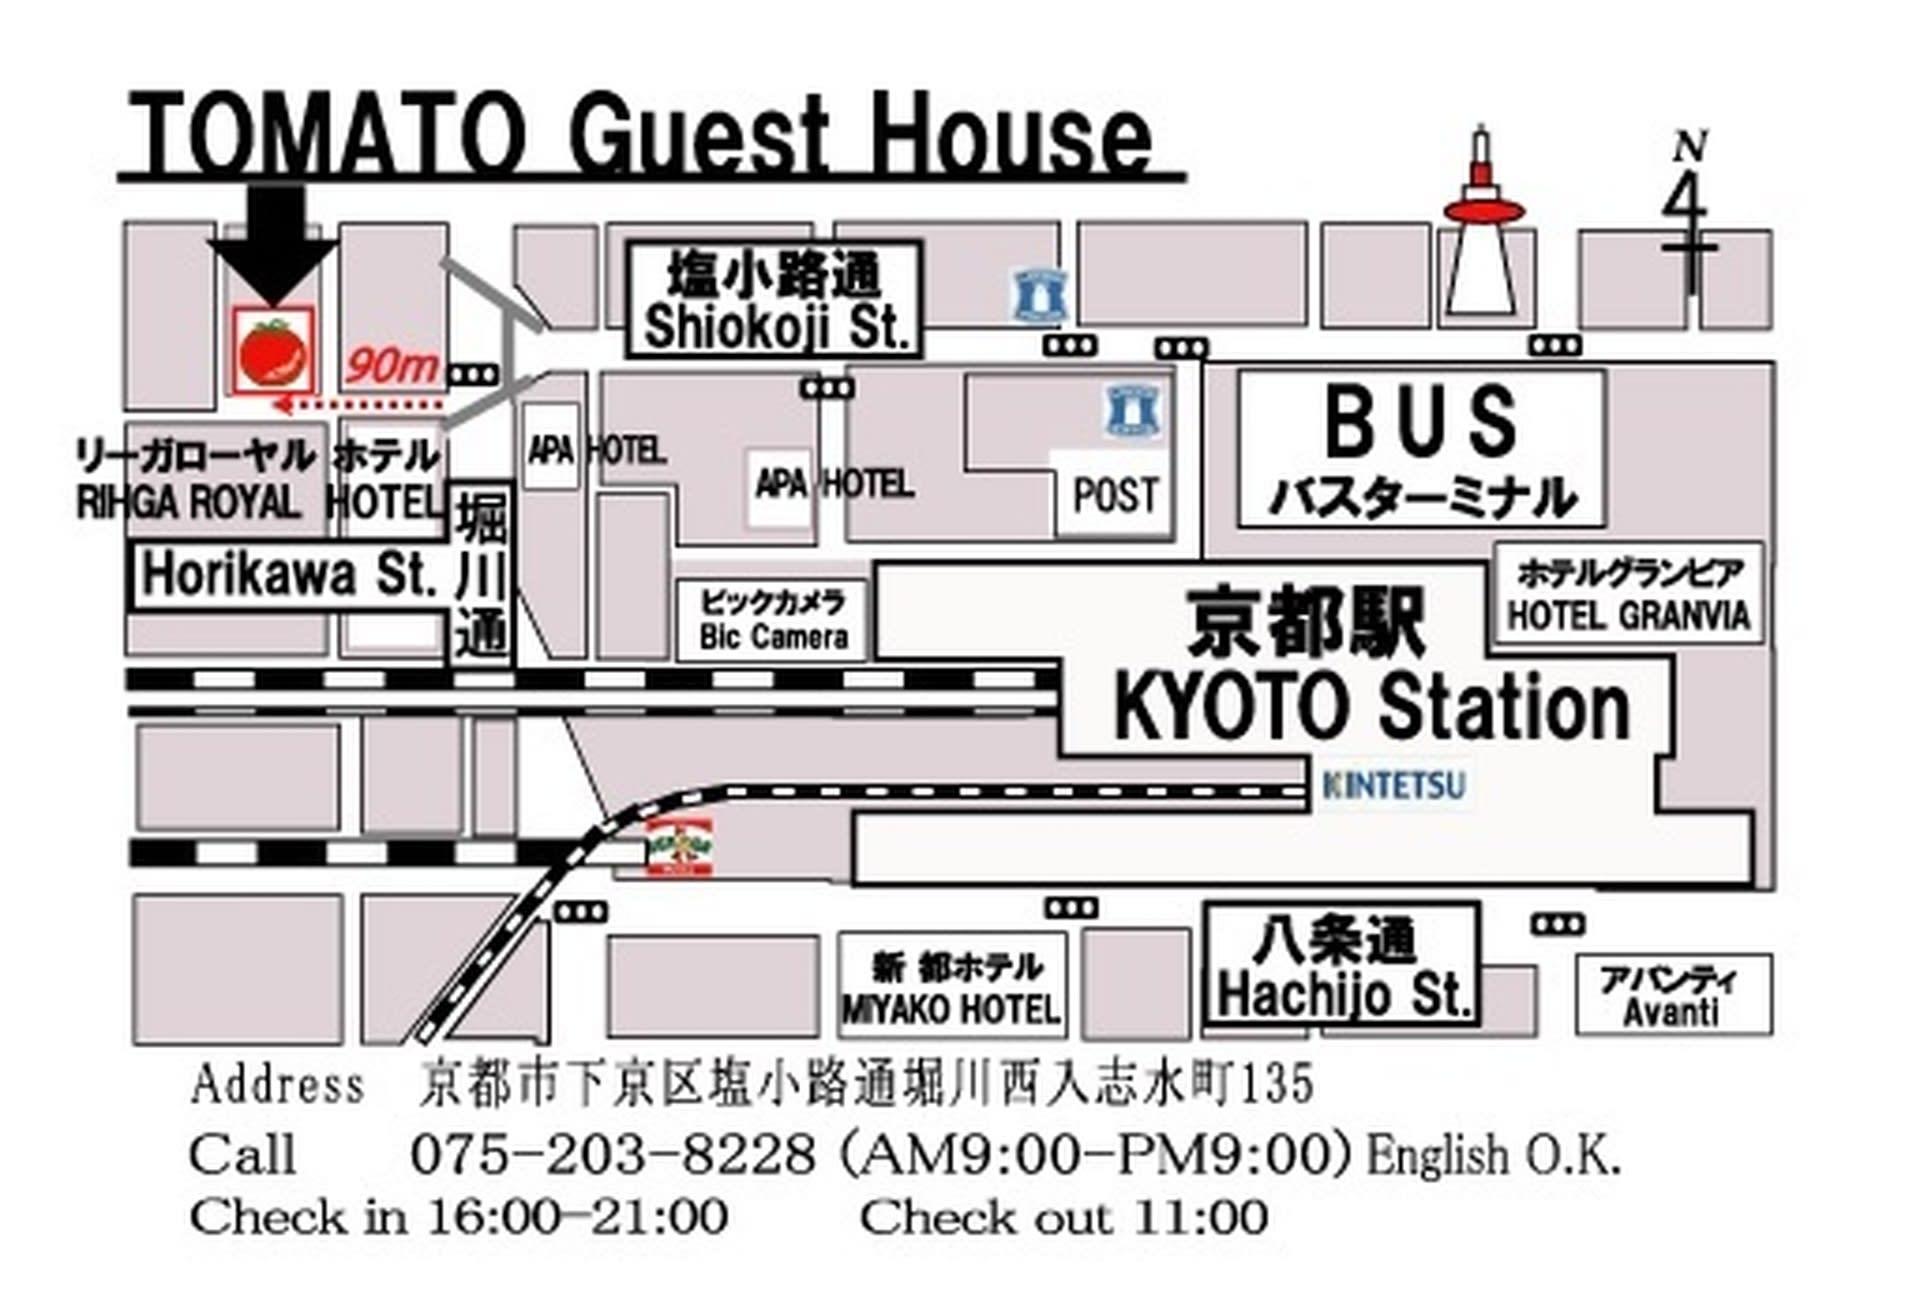 Tomato Kyoto Station